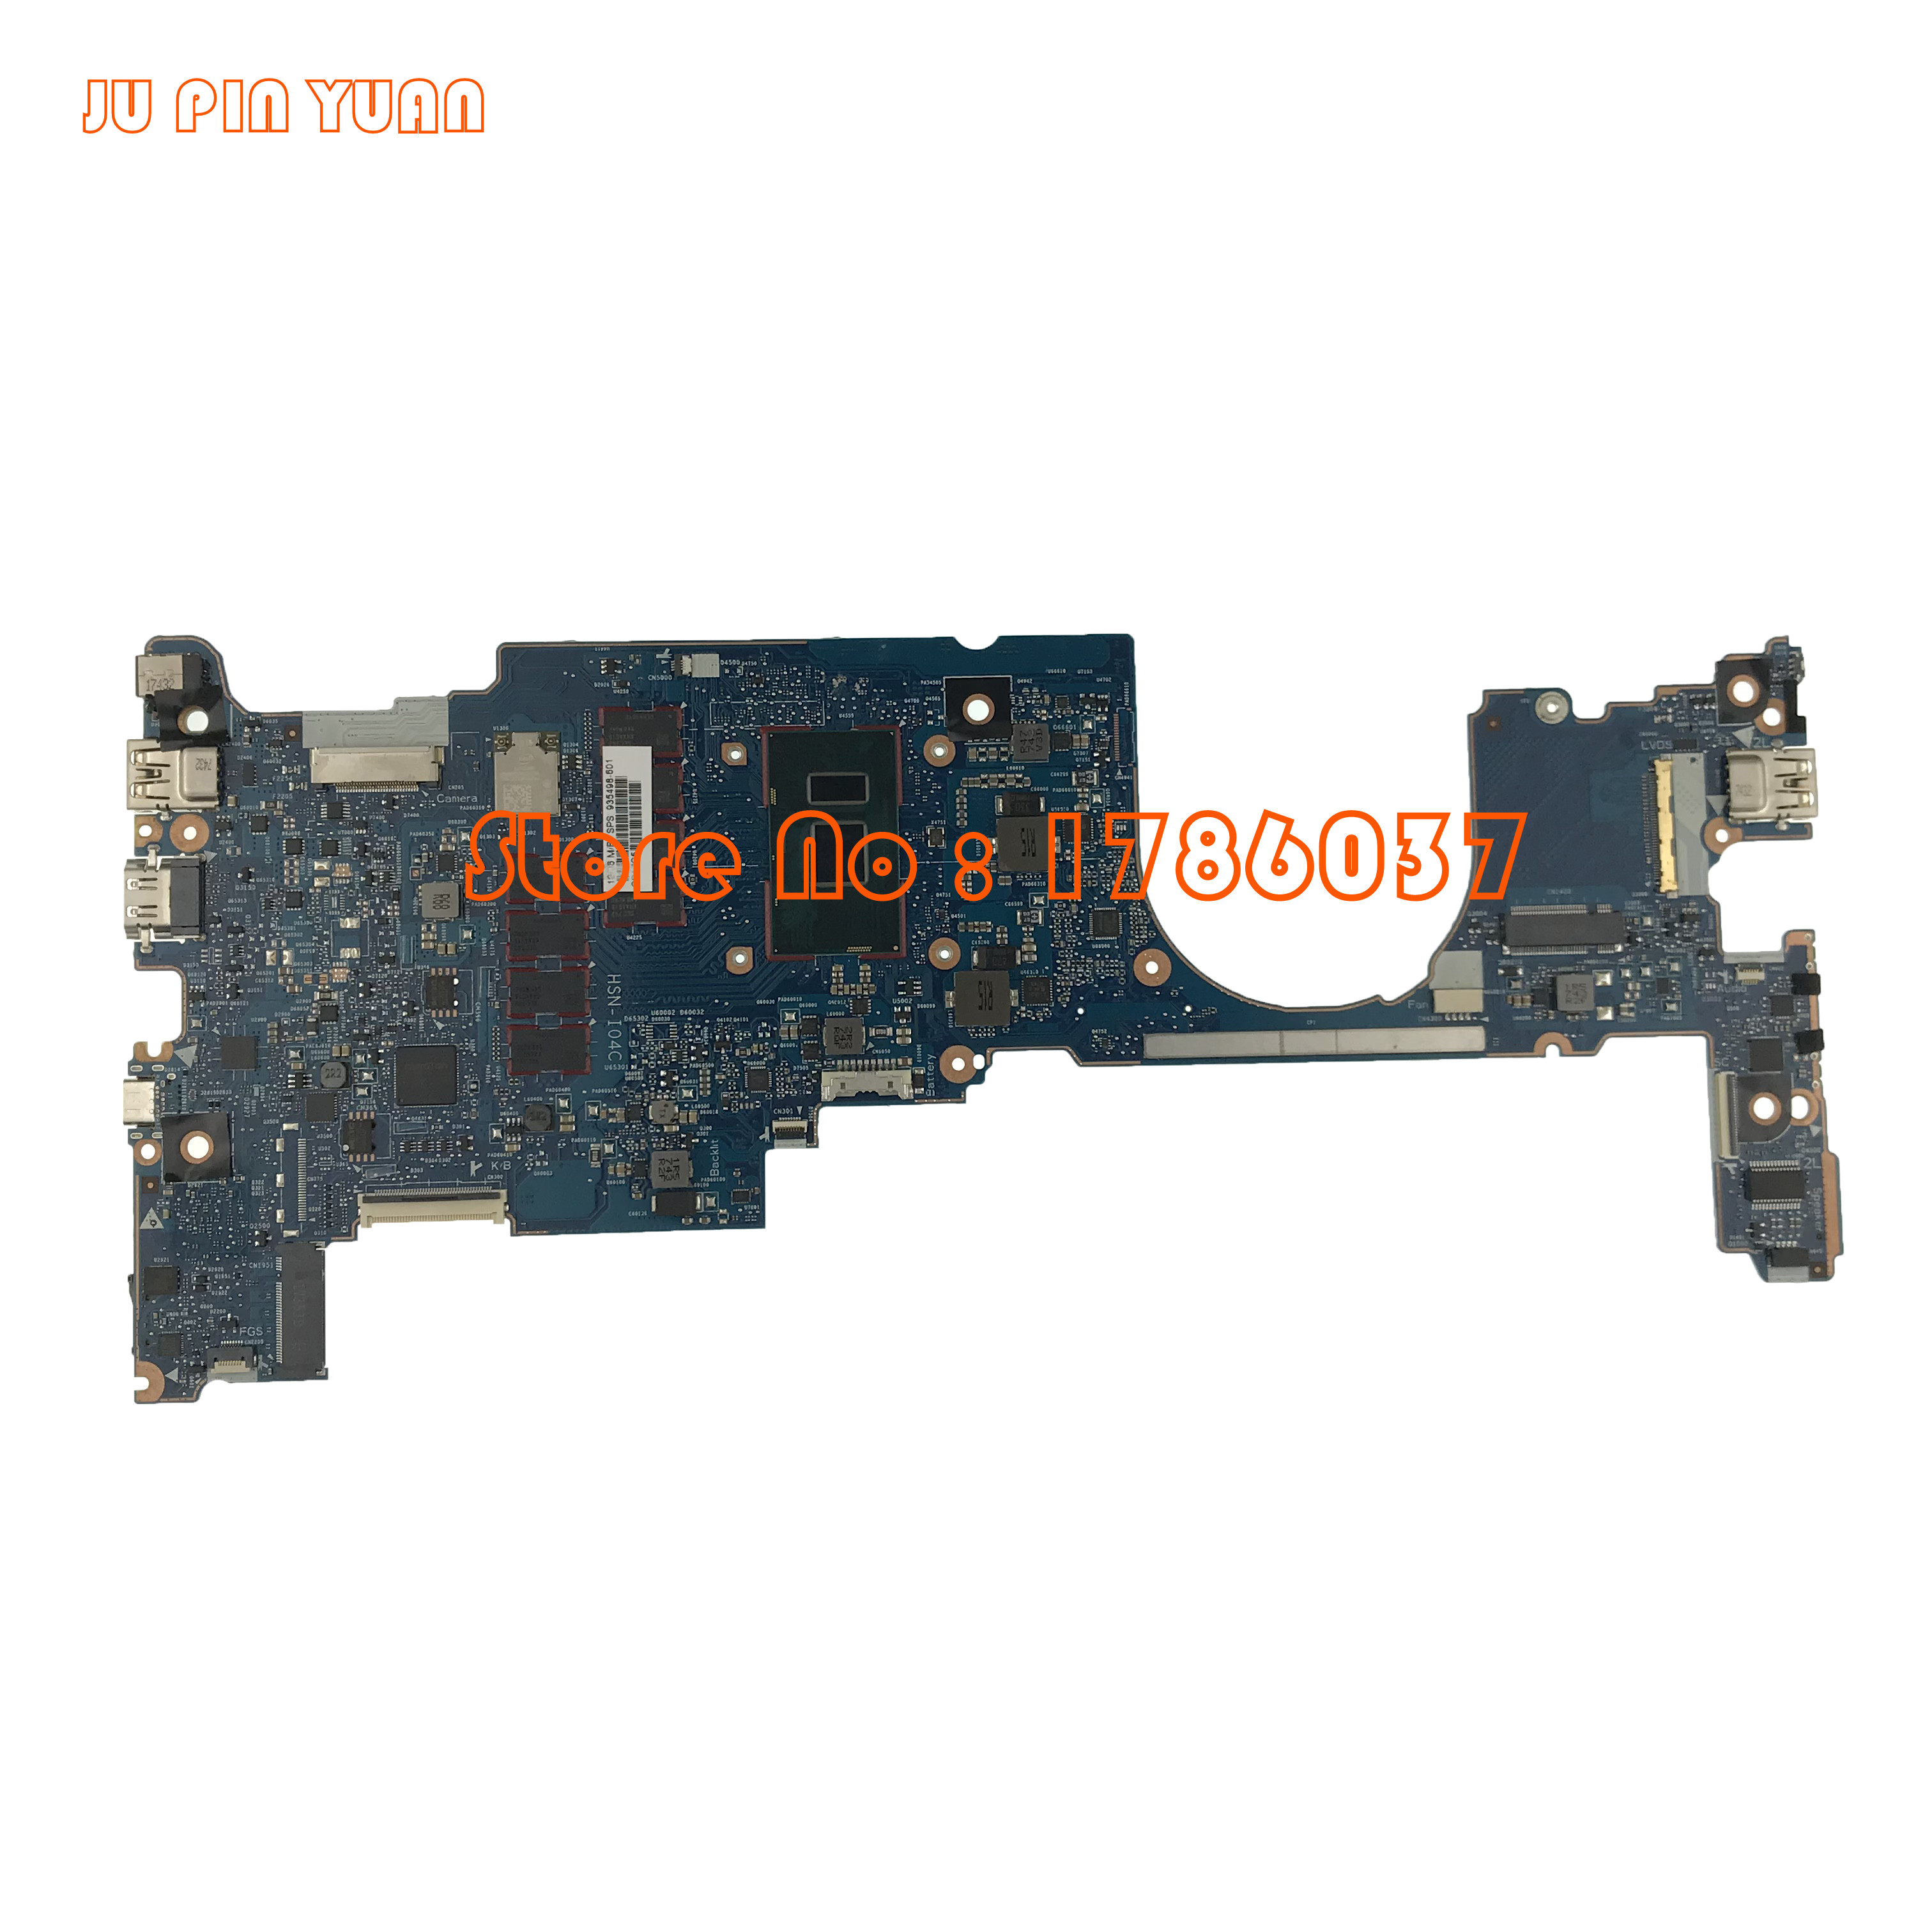 JU PIN YUAN 935498-001 For HP EliteBook X360 1030 G2 Laptop Motherboard 6050A2848001 935498-601100% fully TestedJU PIN YUAN 935498-001 For HP EliteBook X360 1030 G2 Laptop Motherboard 6050A2848001 935498-601100% fully Tested